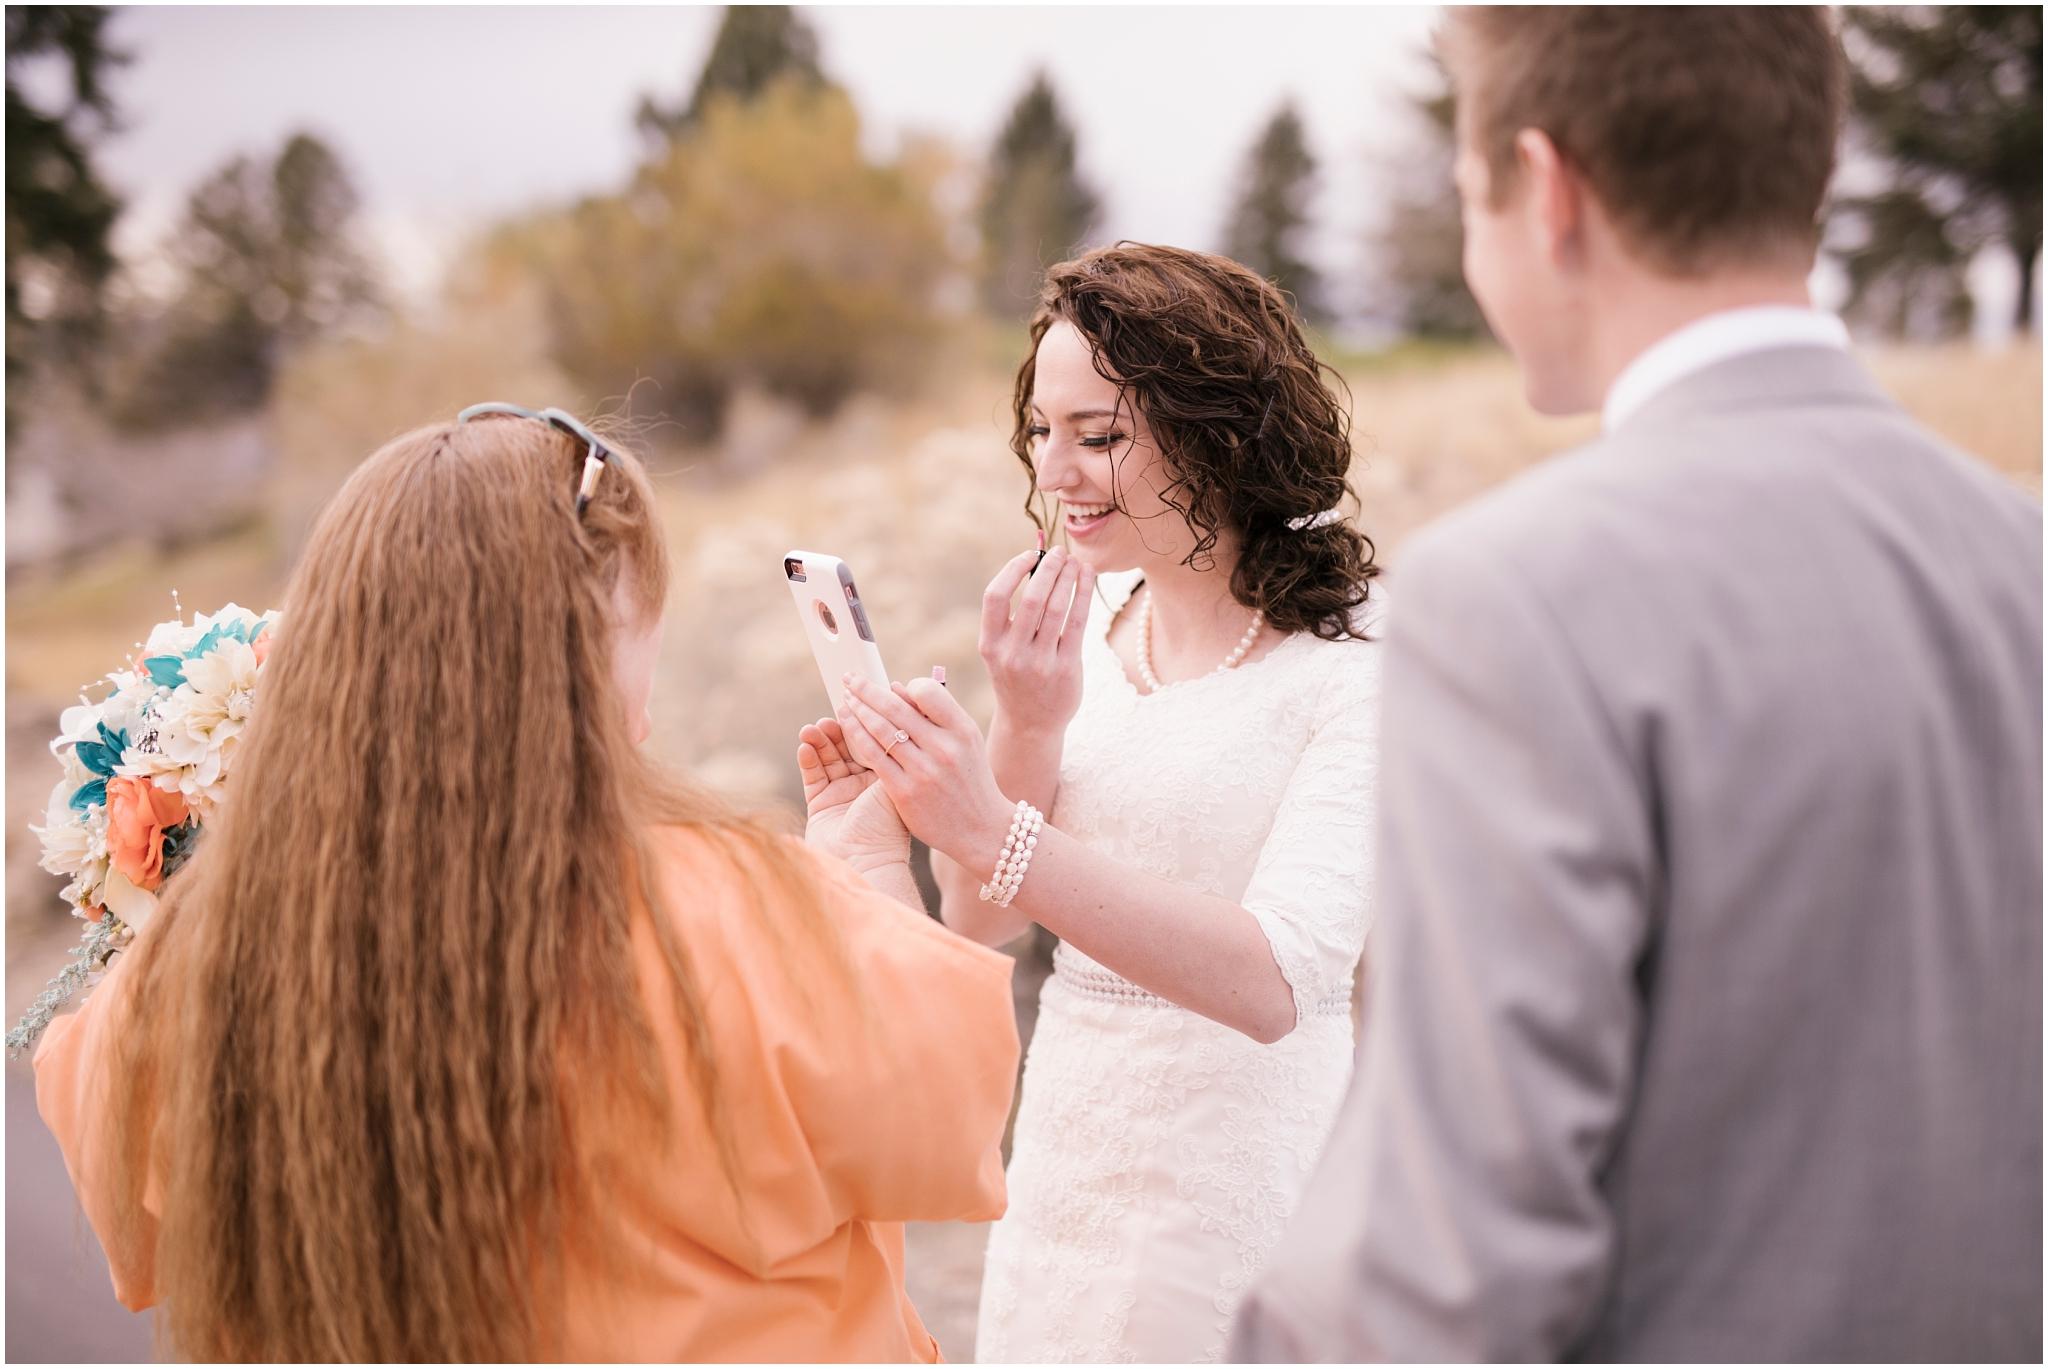 BA-Bridals-96_Lizzie-B-Imagery-Utah-Wedding-Photographer-Central-Utah-Photographer-Utah-County-Manti-Utah-Temple.jpg